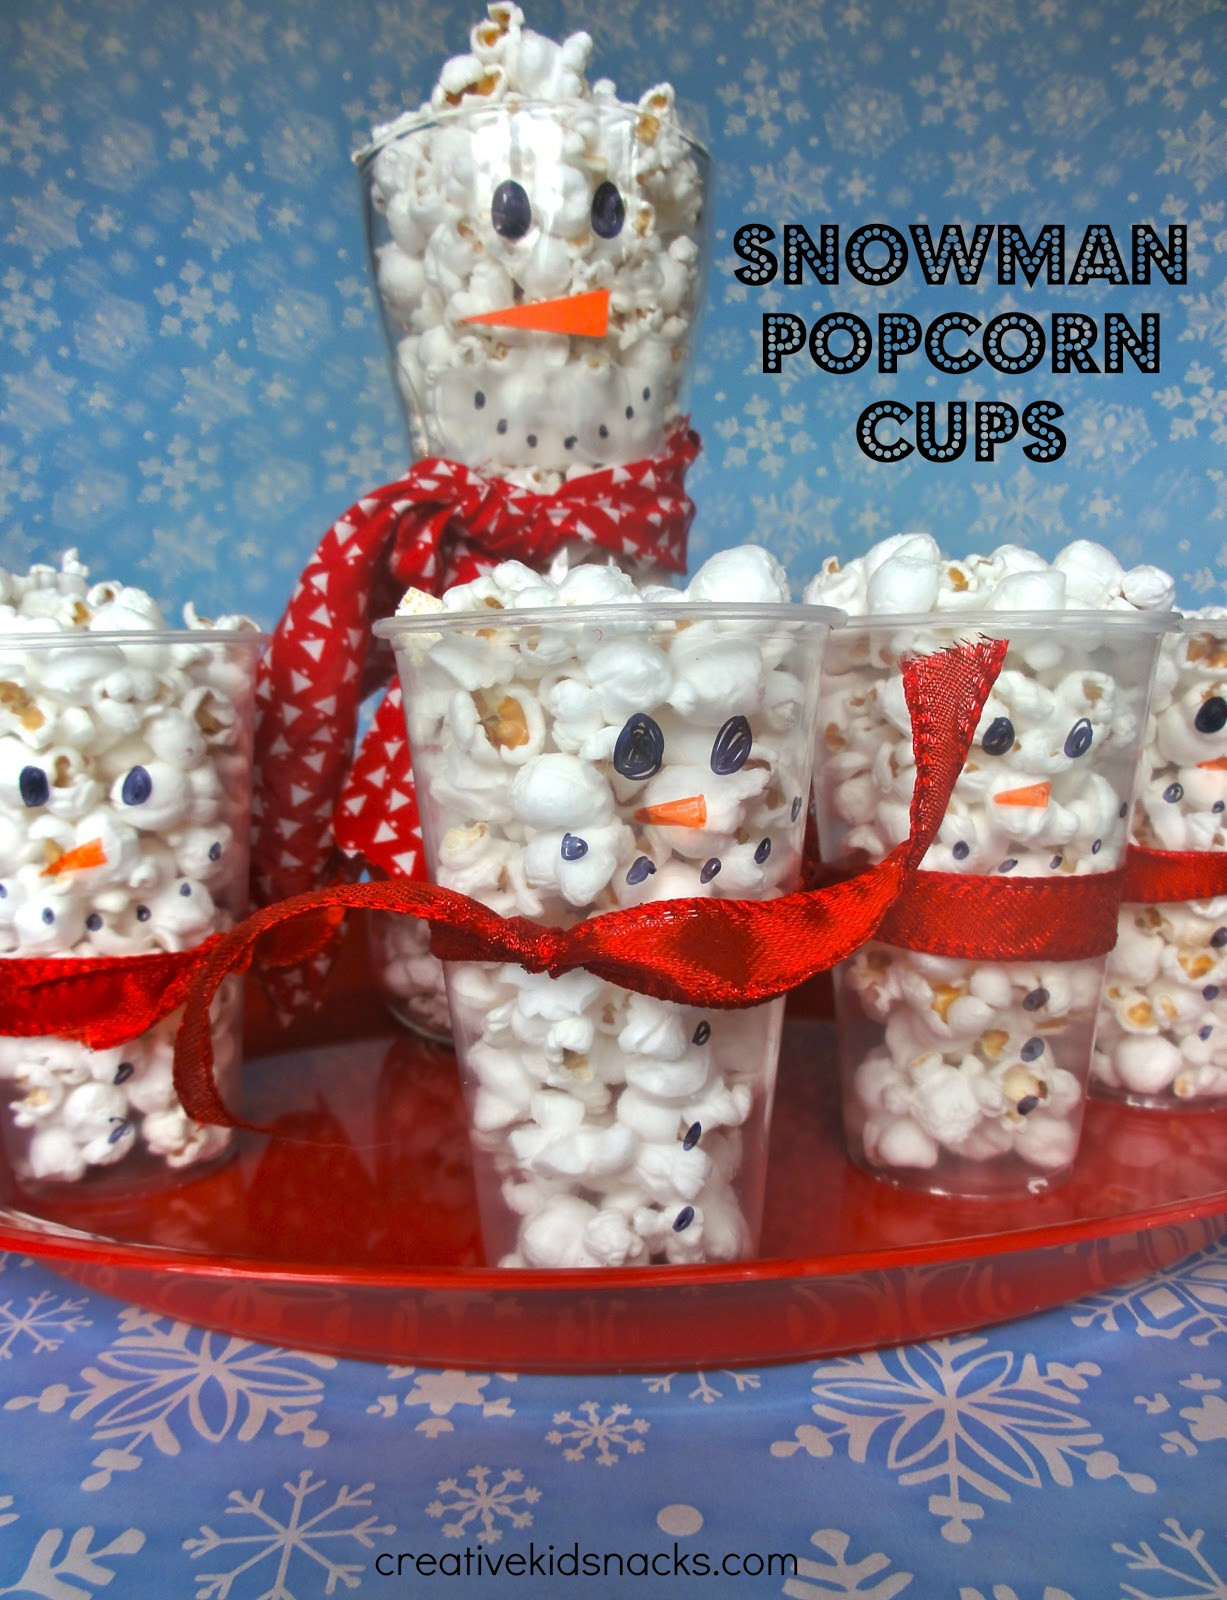 Healthy Christmas Snacks For School Parties  Creative Kid Snacks